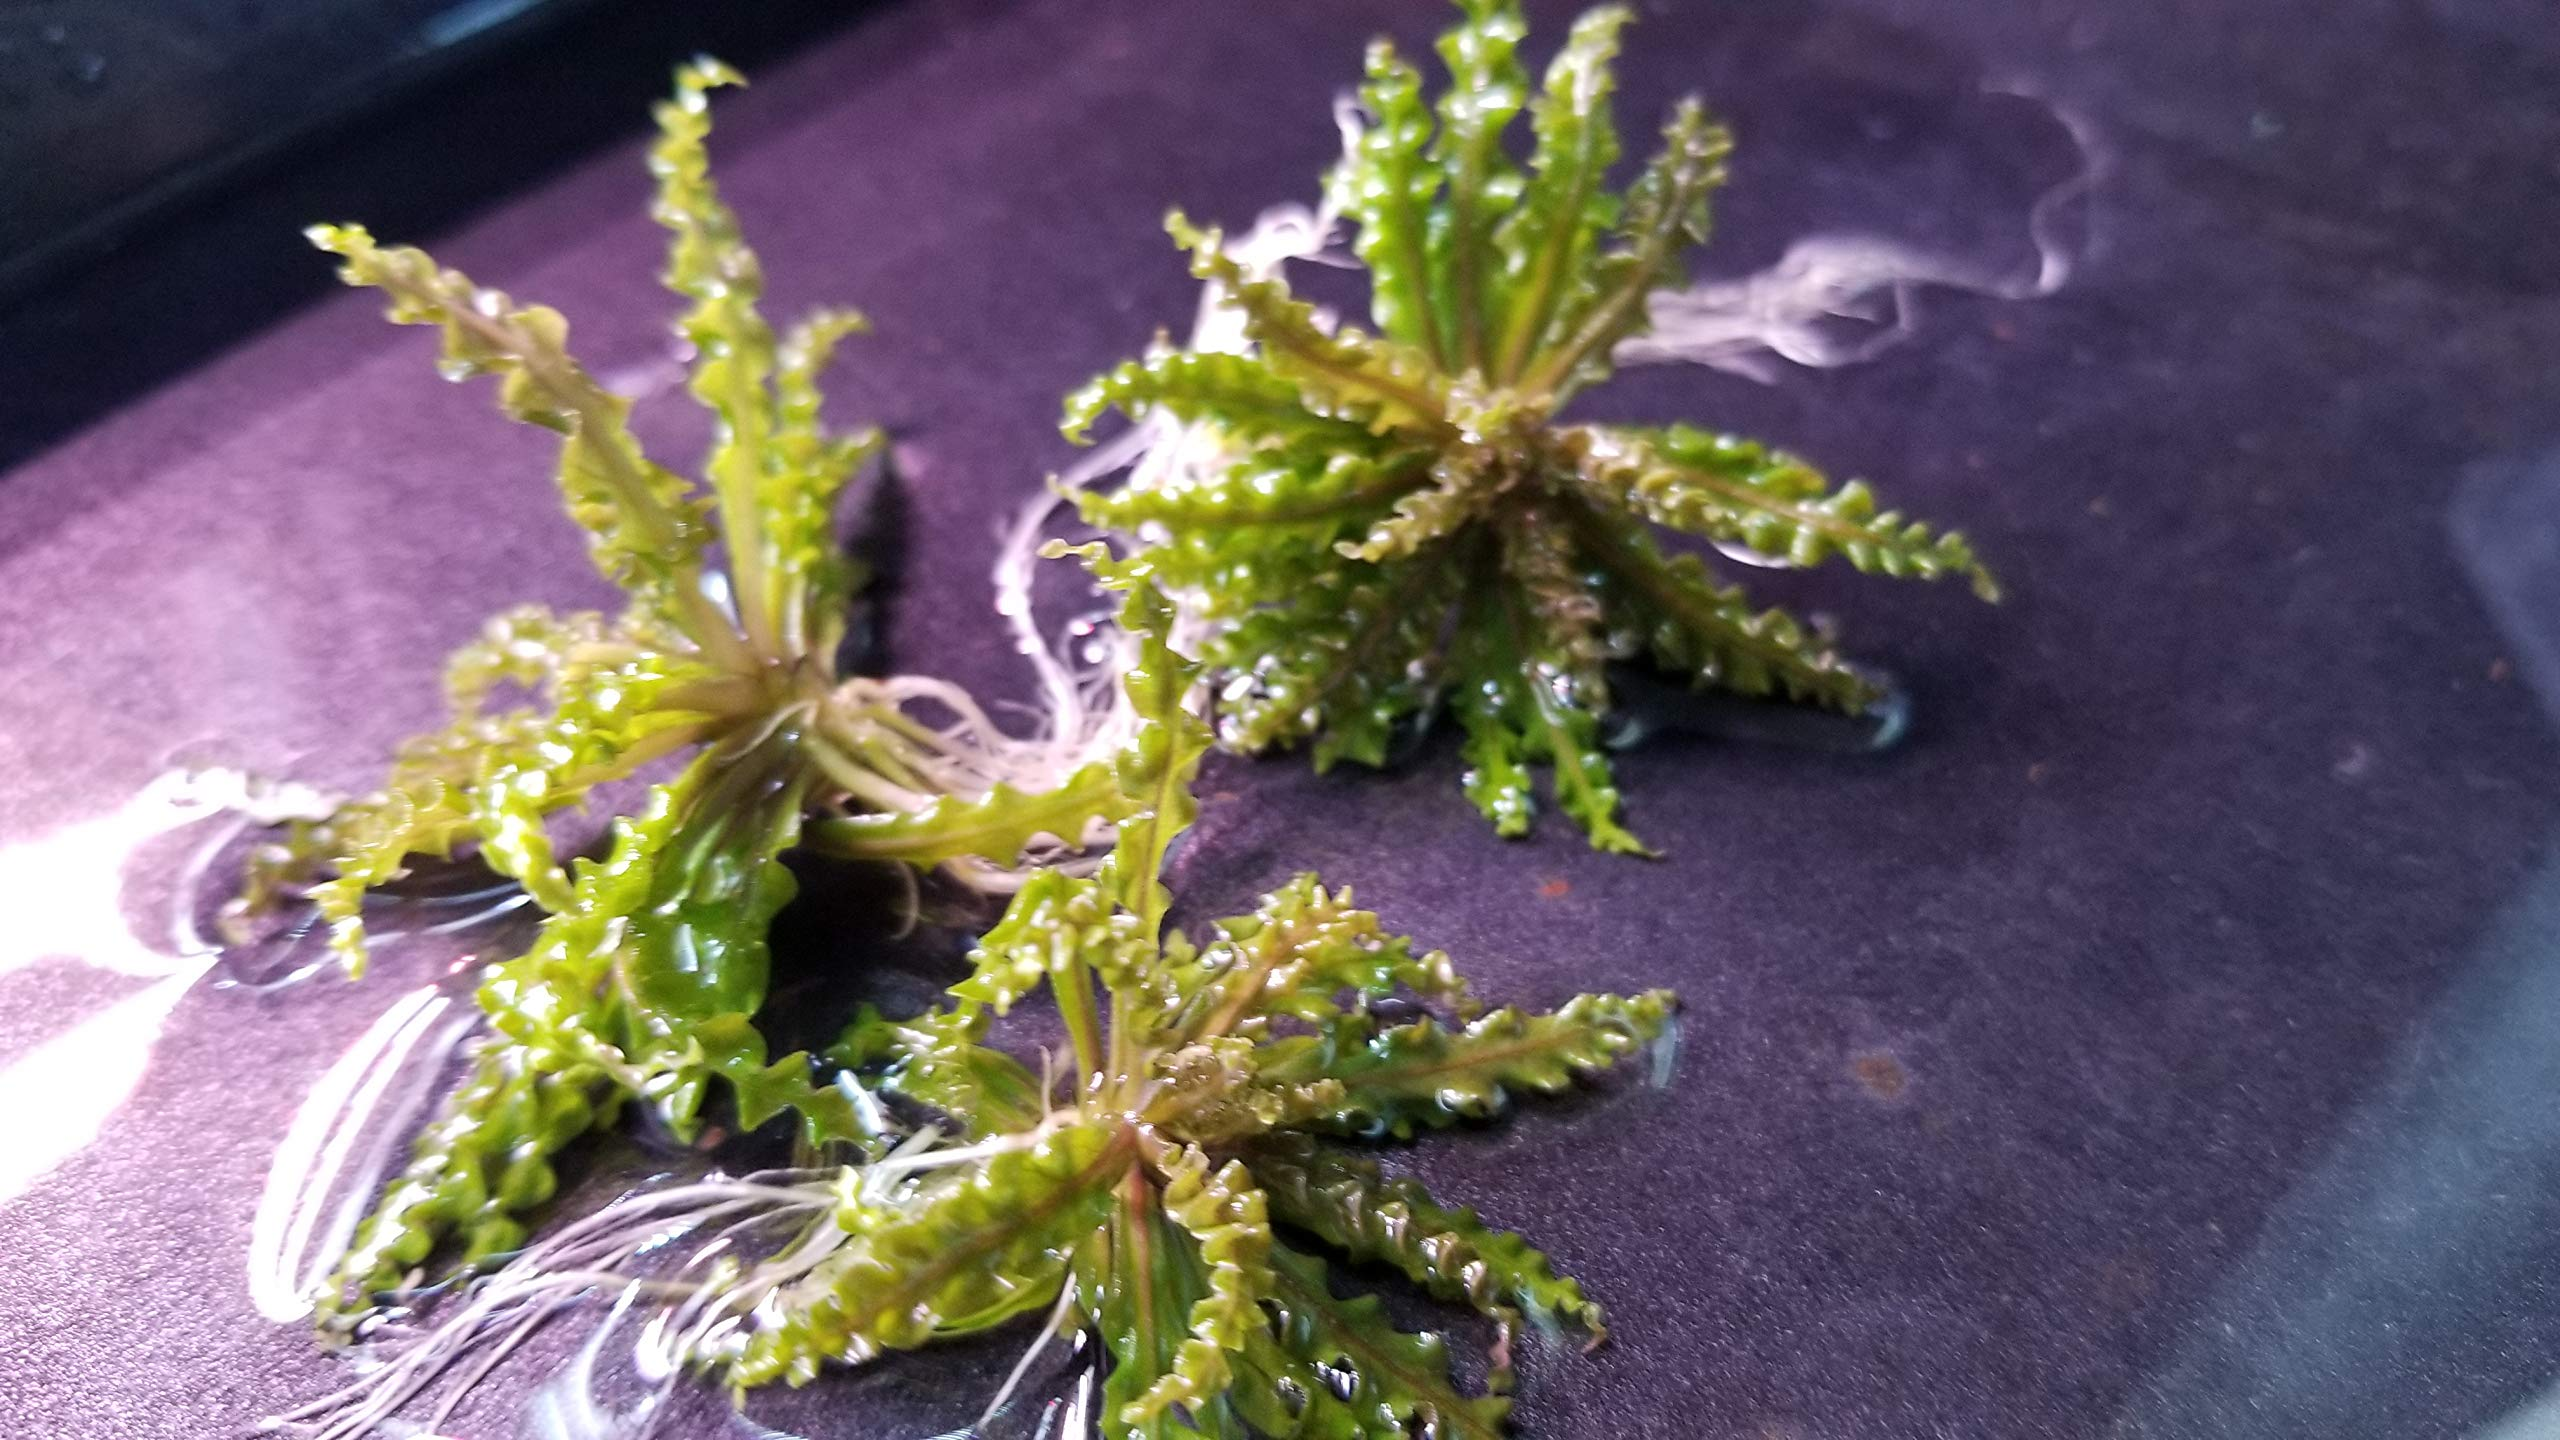 Pogostemon Helferi Downoi Red, Rare, Small + Free See Description, Live Aquarium Plants by Pearlingplants